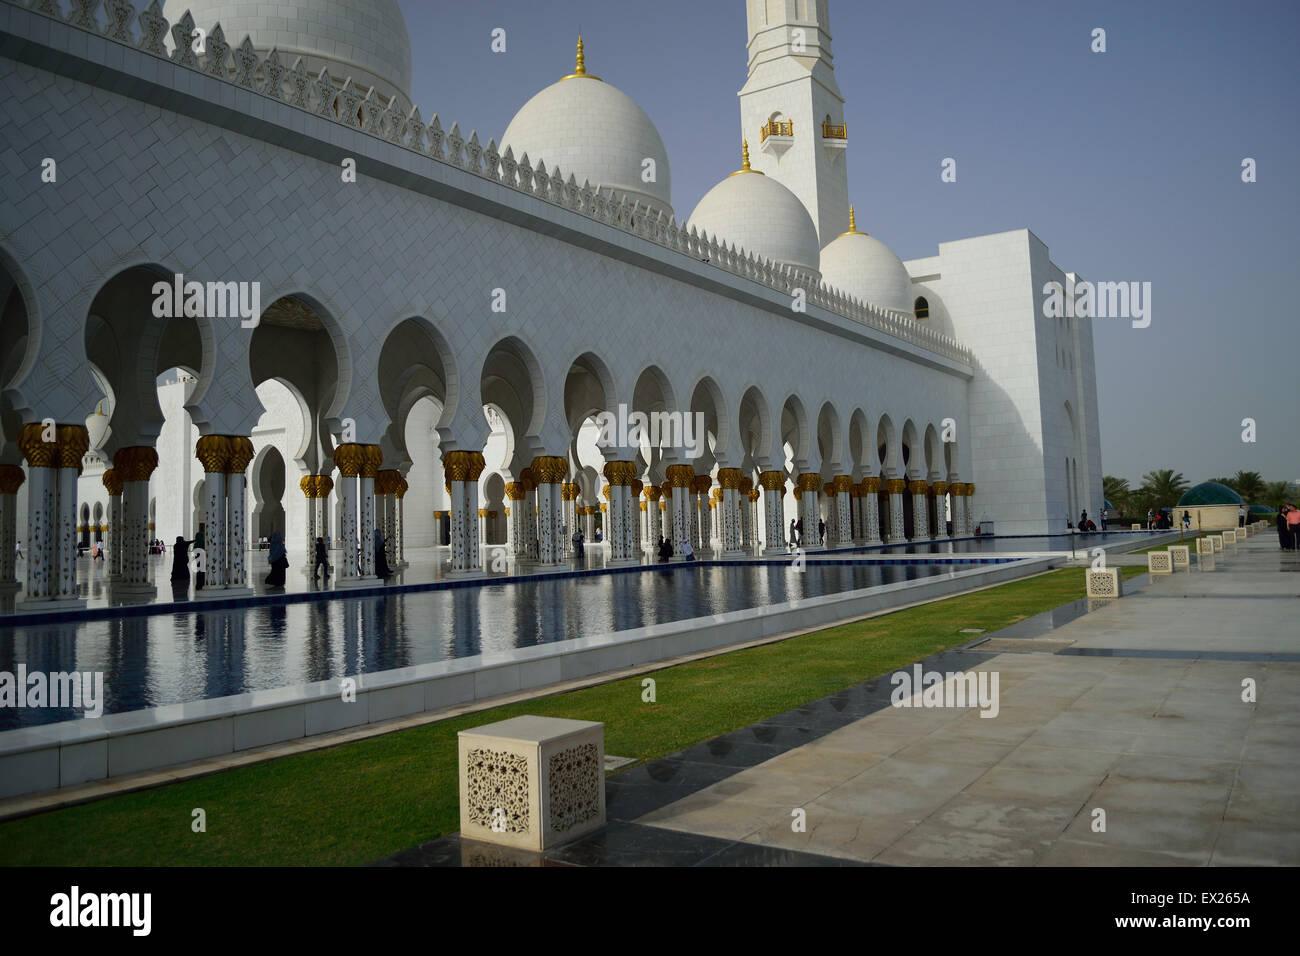 Sheikh Zayed Mosque - Abu Dhabi - Stock Image